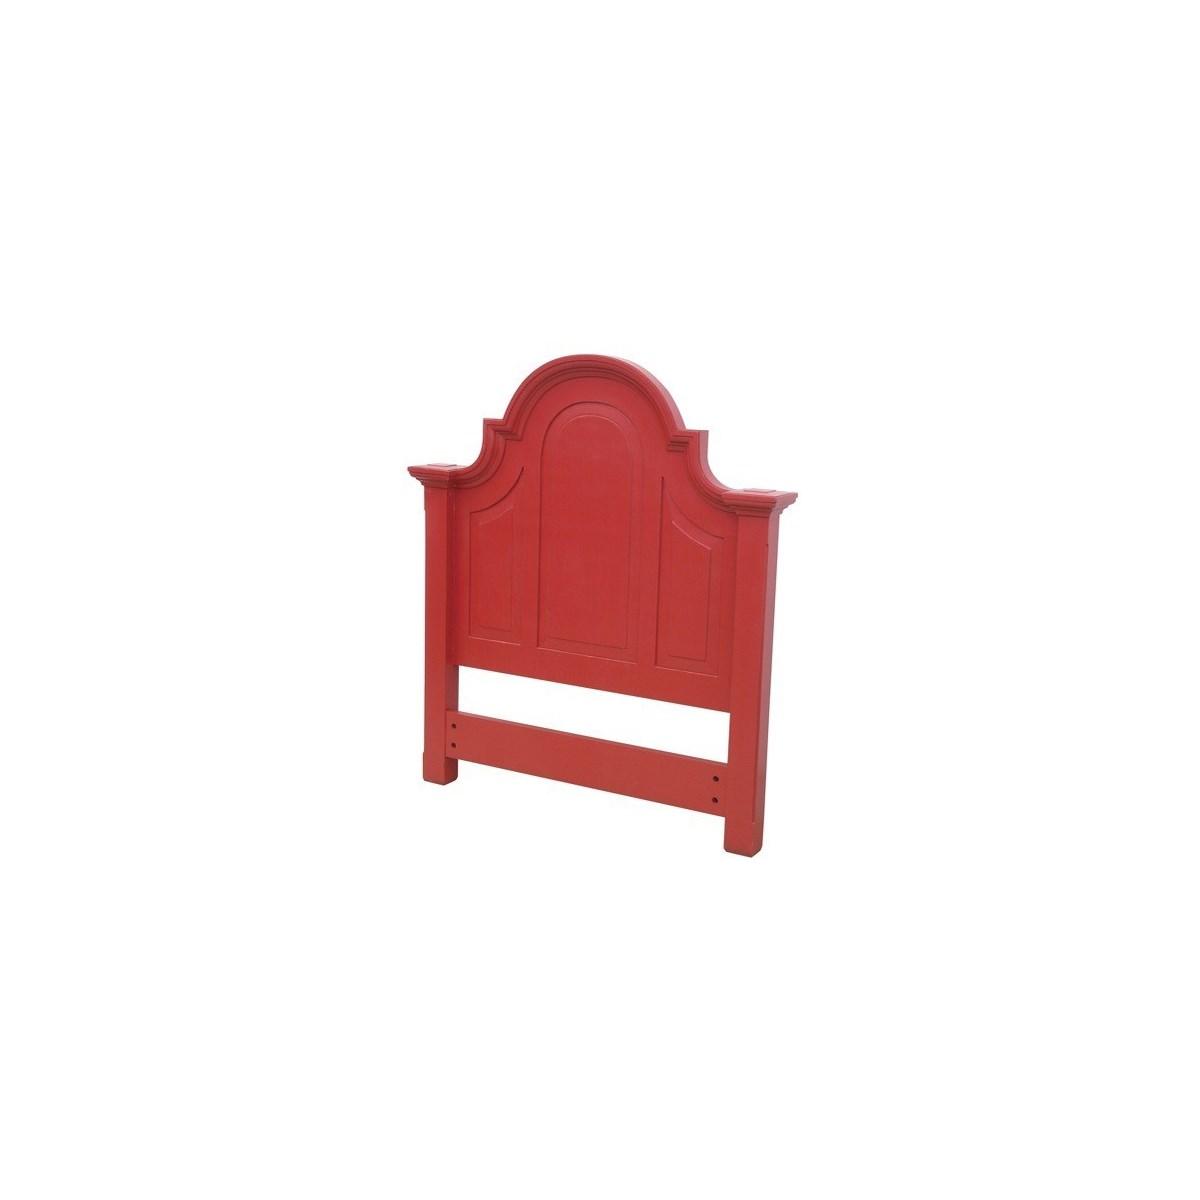 CHESAPEAKE TWIN HEADBOARD - RED